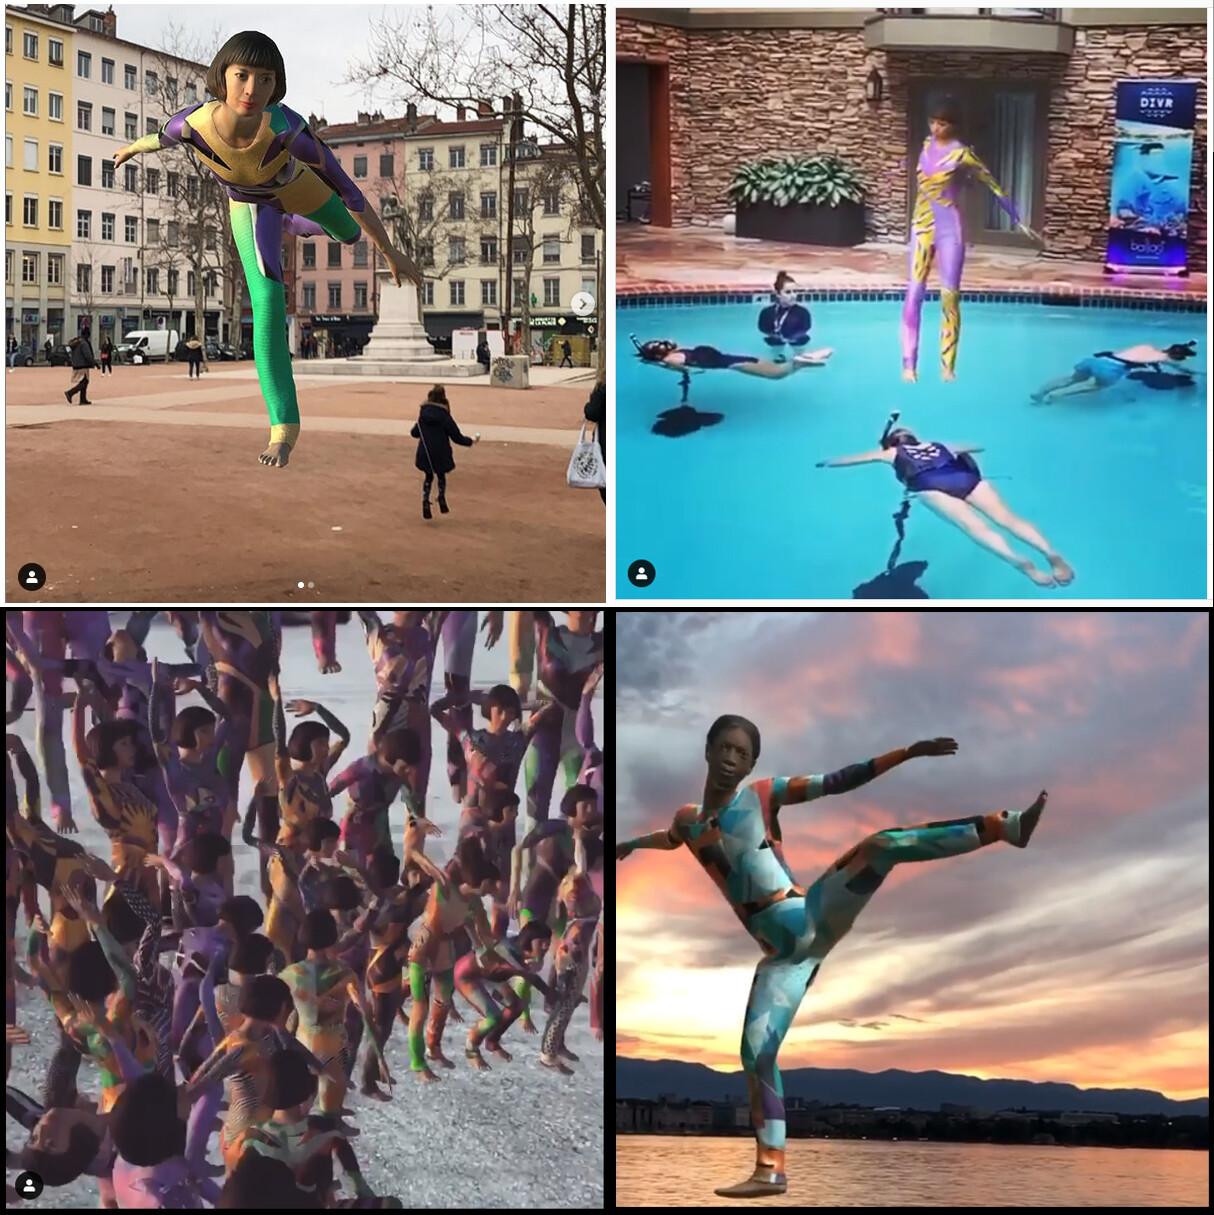 Pics from Instagram #Dancetrail